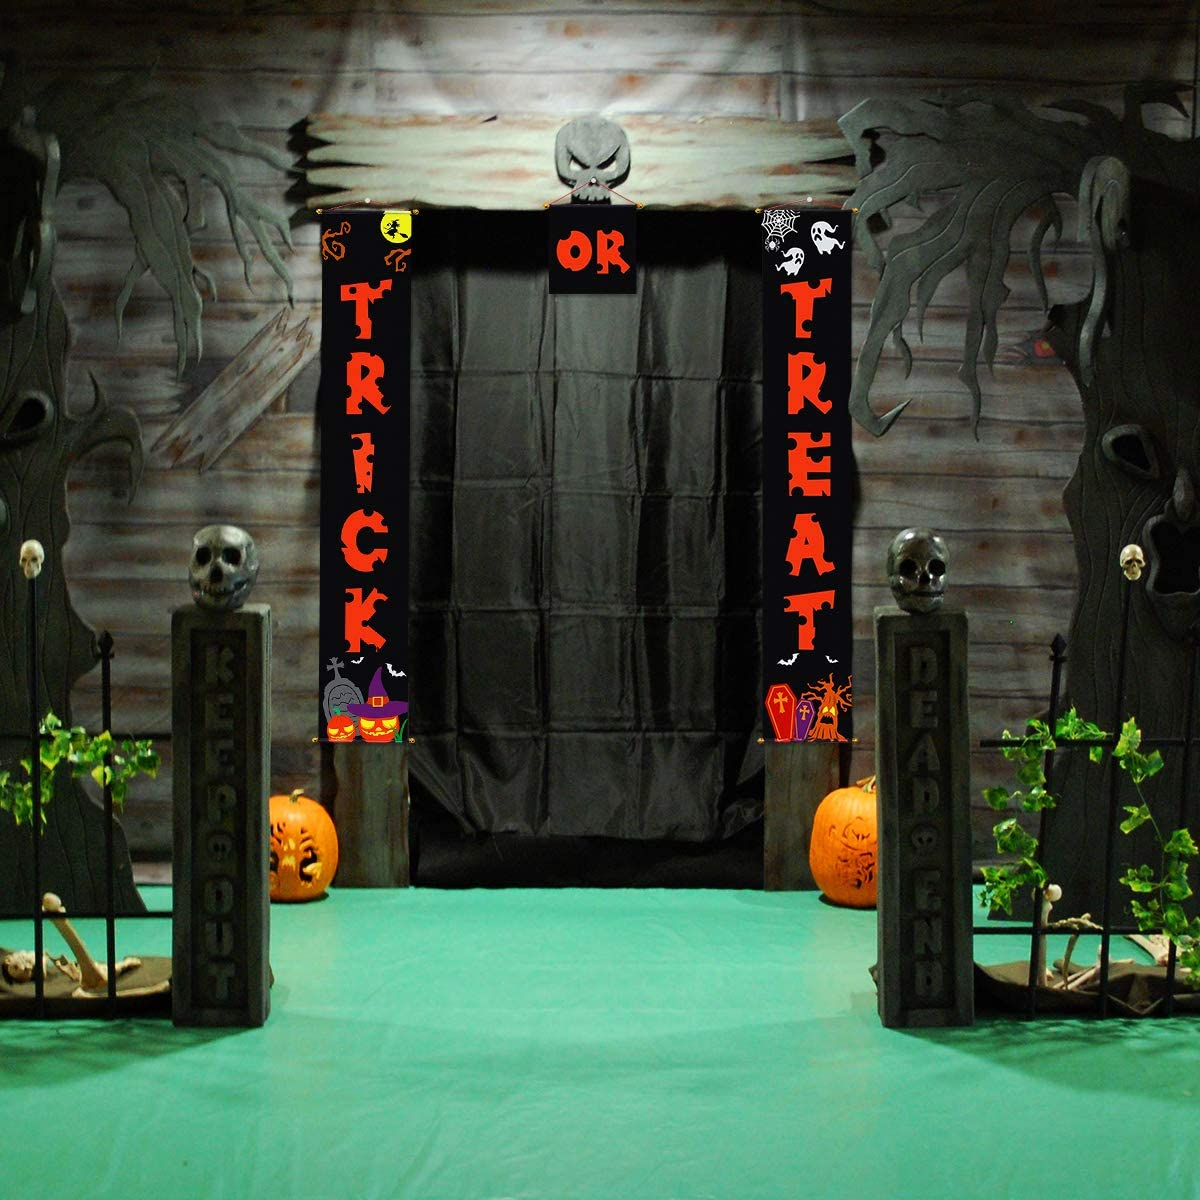 Halloween Decorations Door Banners for Trick or Treat Banner For Home Office Door Decal 3pcs